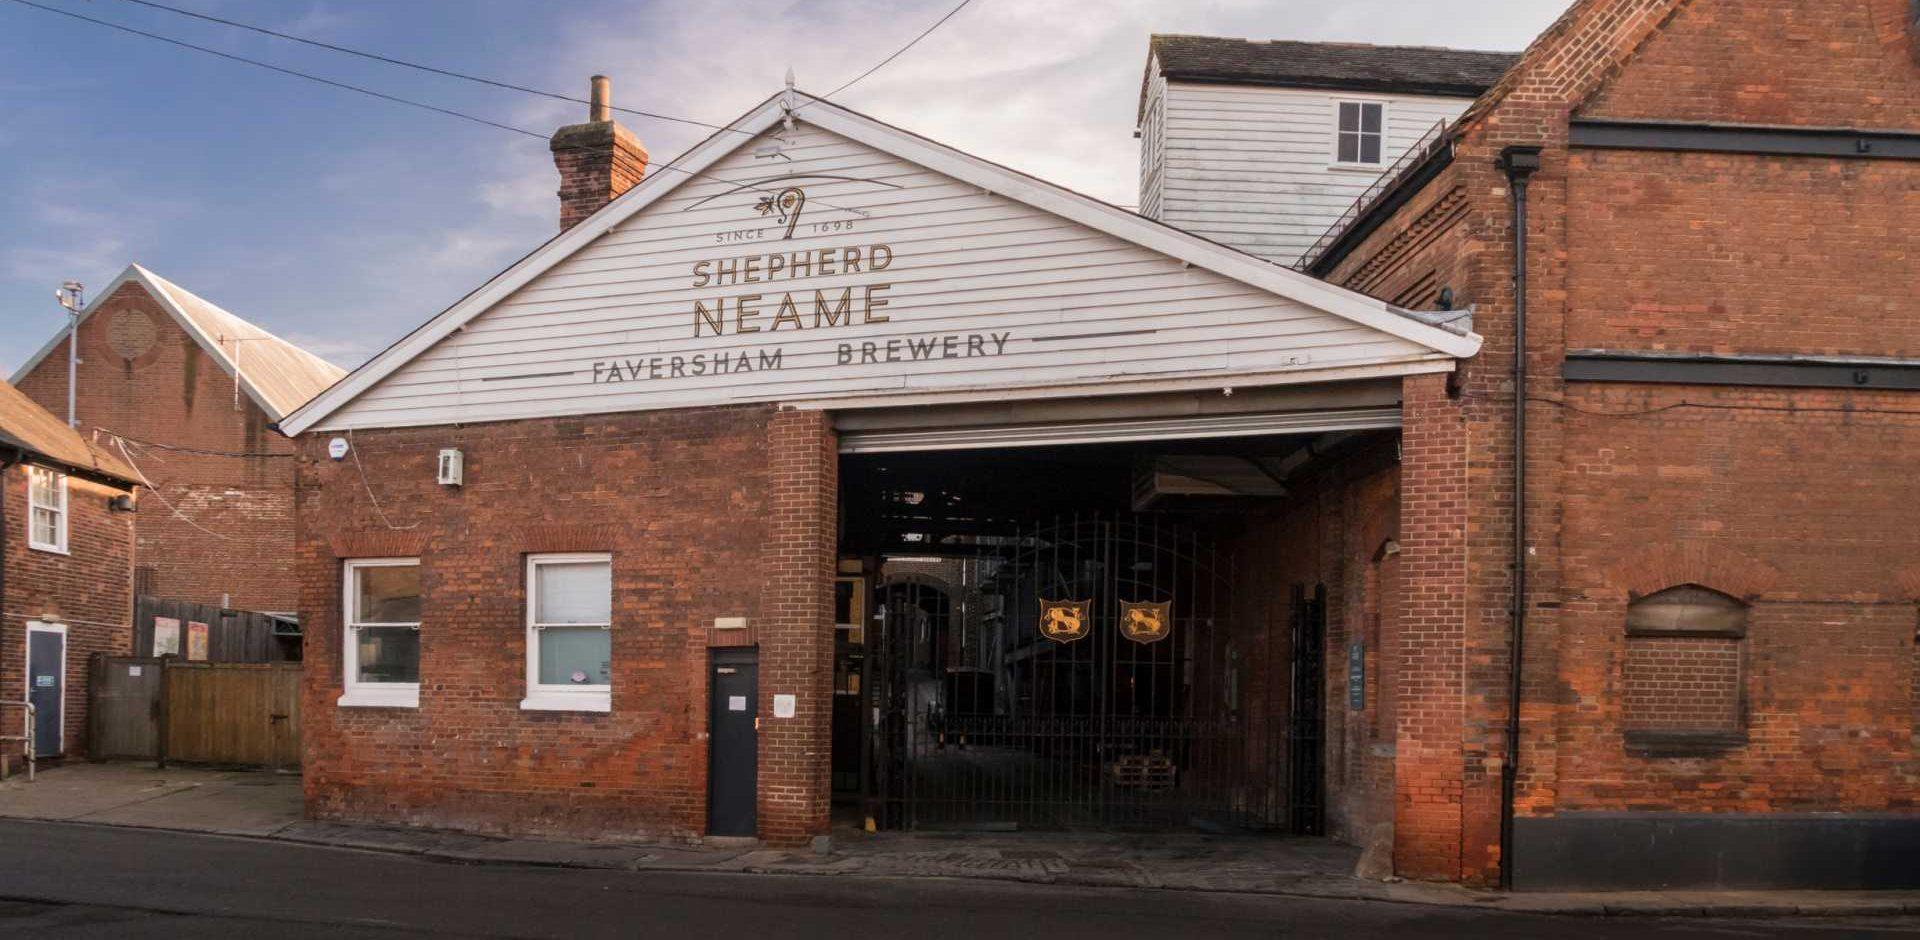 Faversham, Kent, UK, November 2019 - The Shepherd Neame Brewery building in the medieval market town of Faversham, Kent, UK - Shutterstock